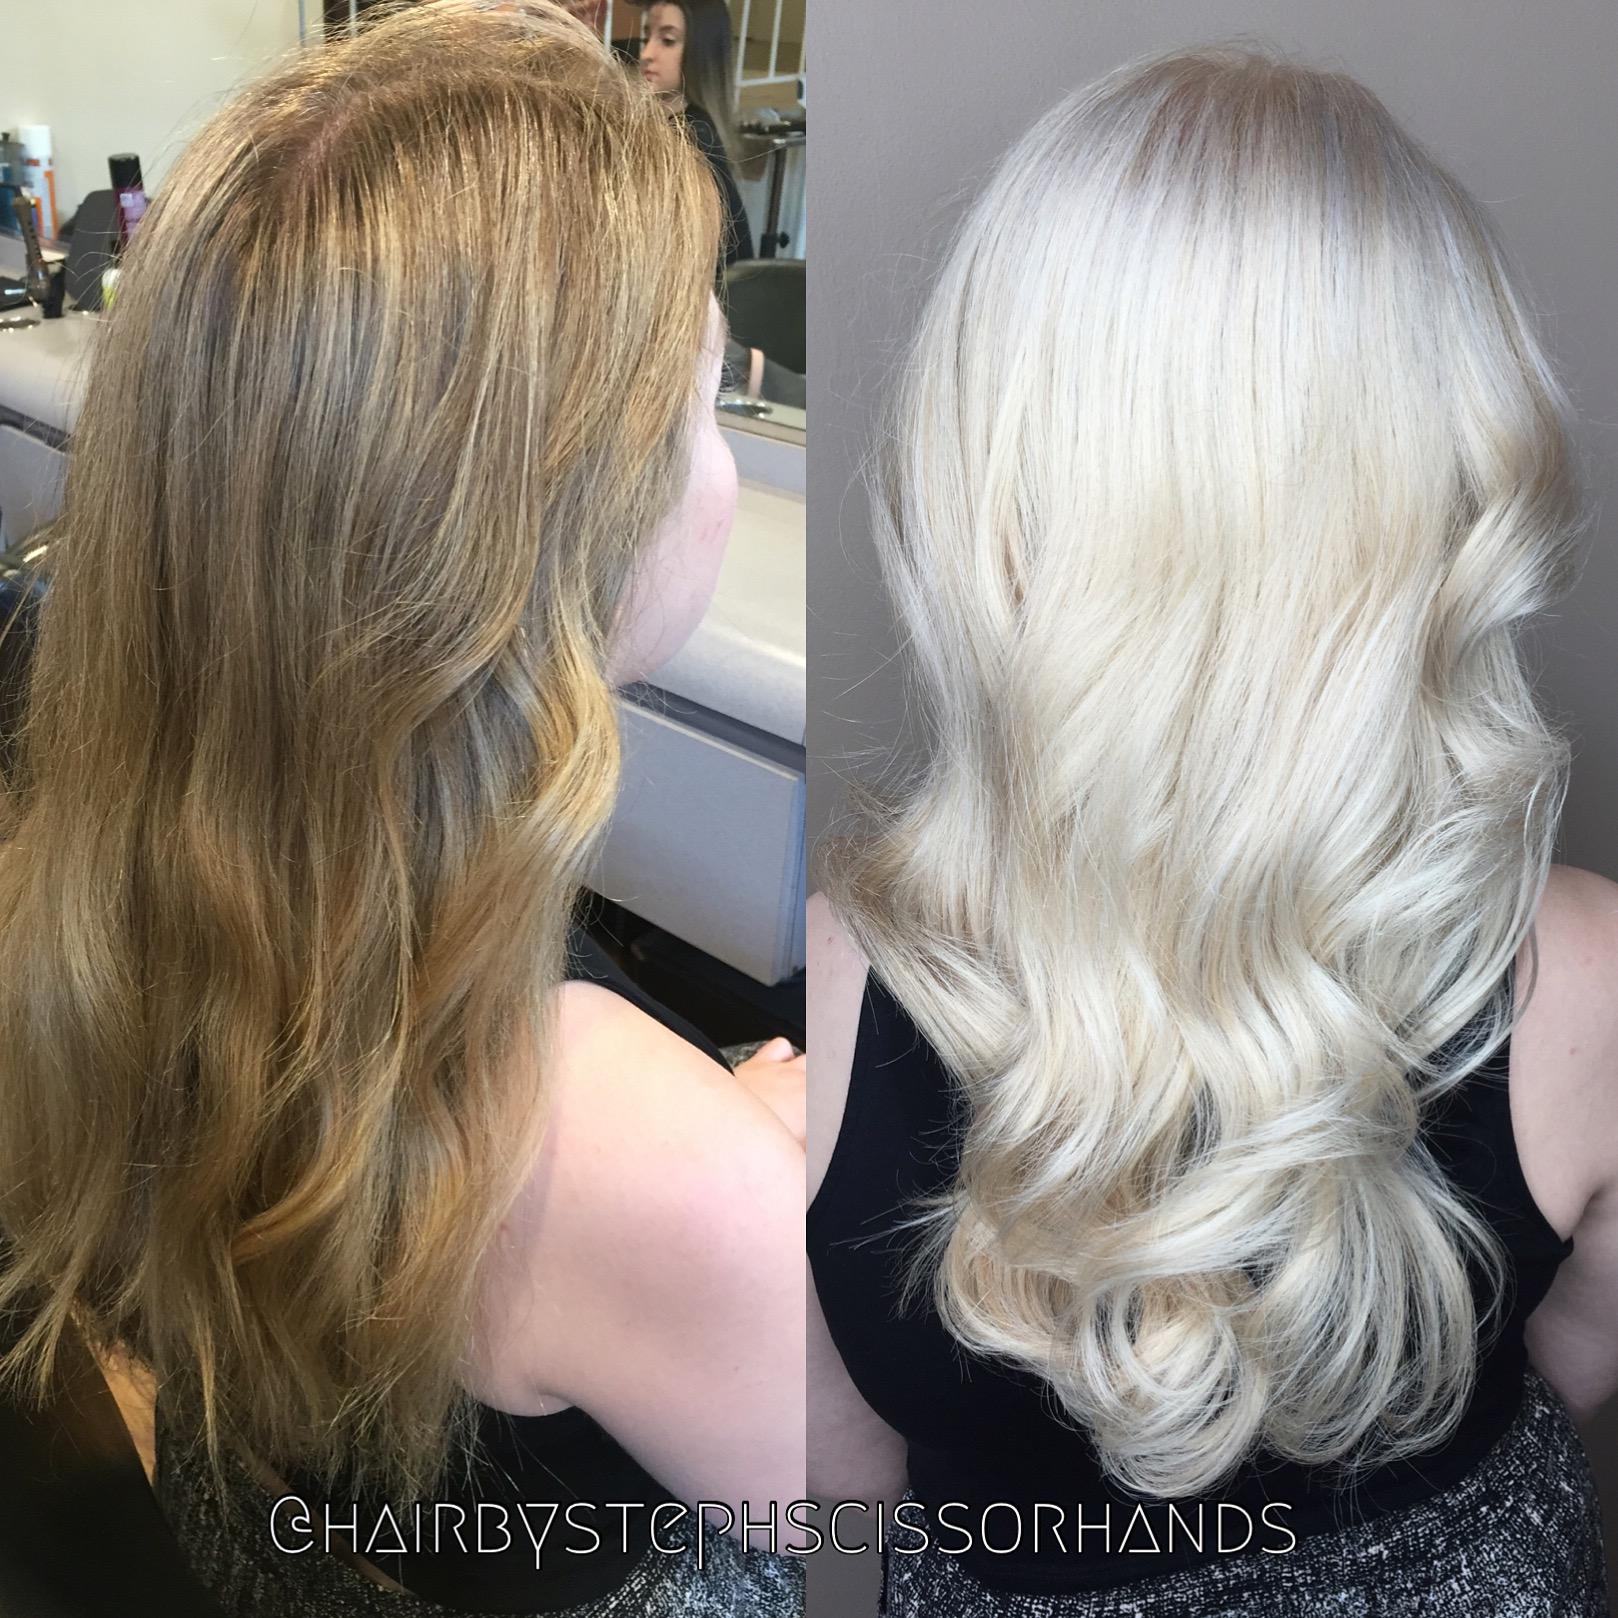 fanola no yellow shampoo. makeover: classic highlights to platinum fanola no yellow shampoo